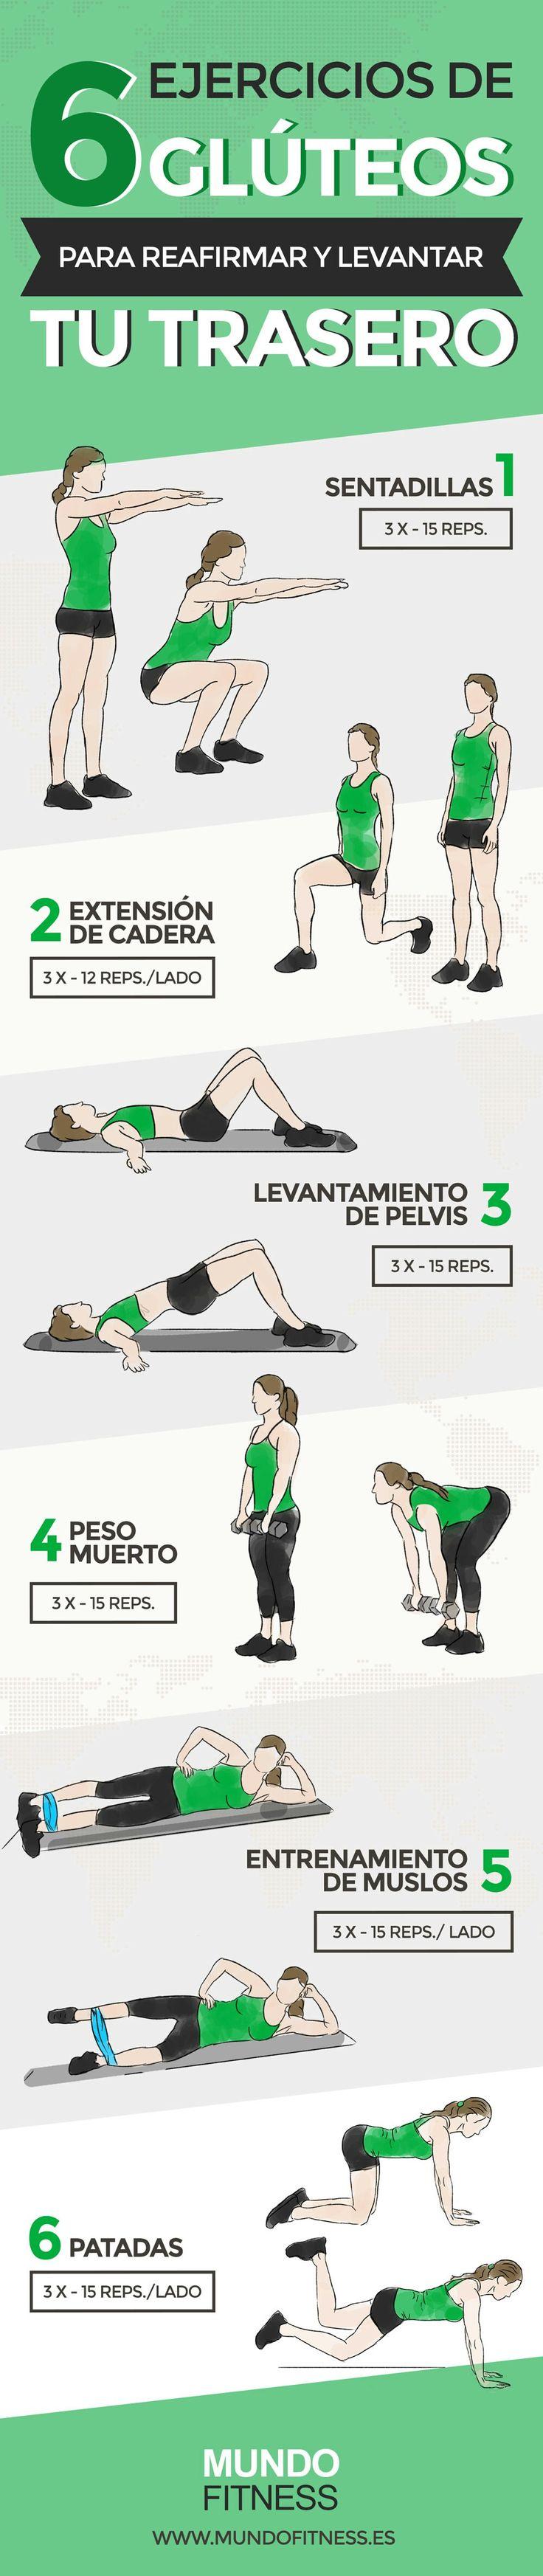 Workout glúteos